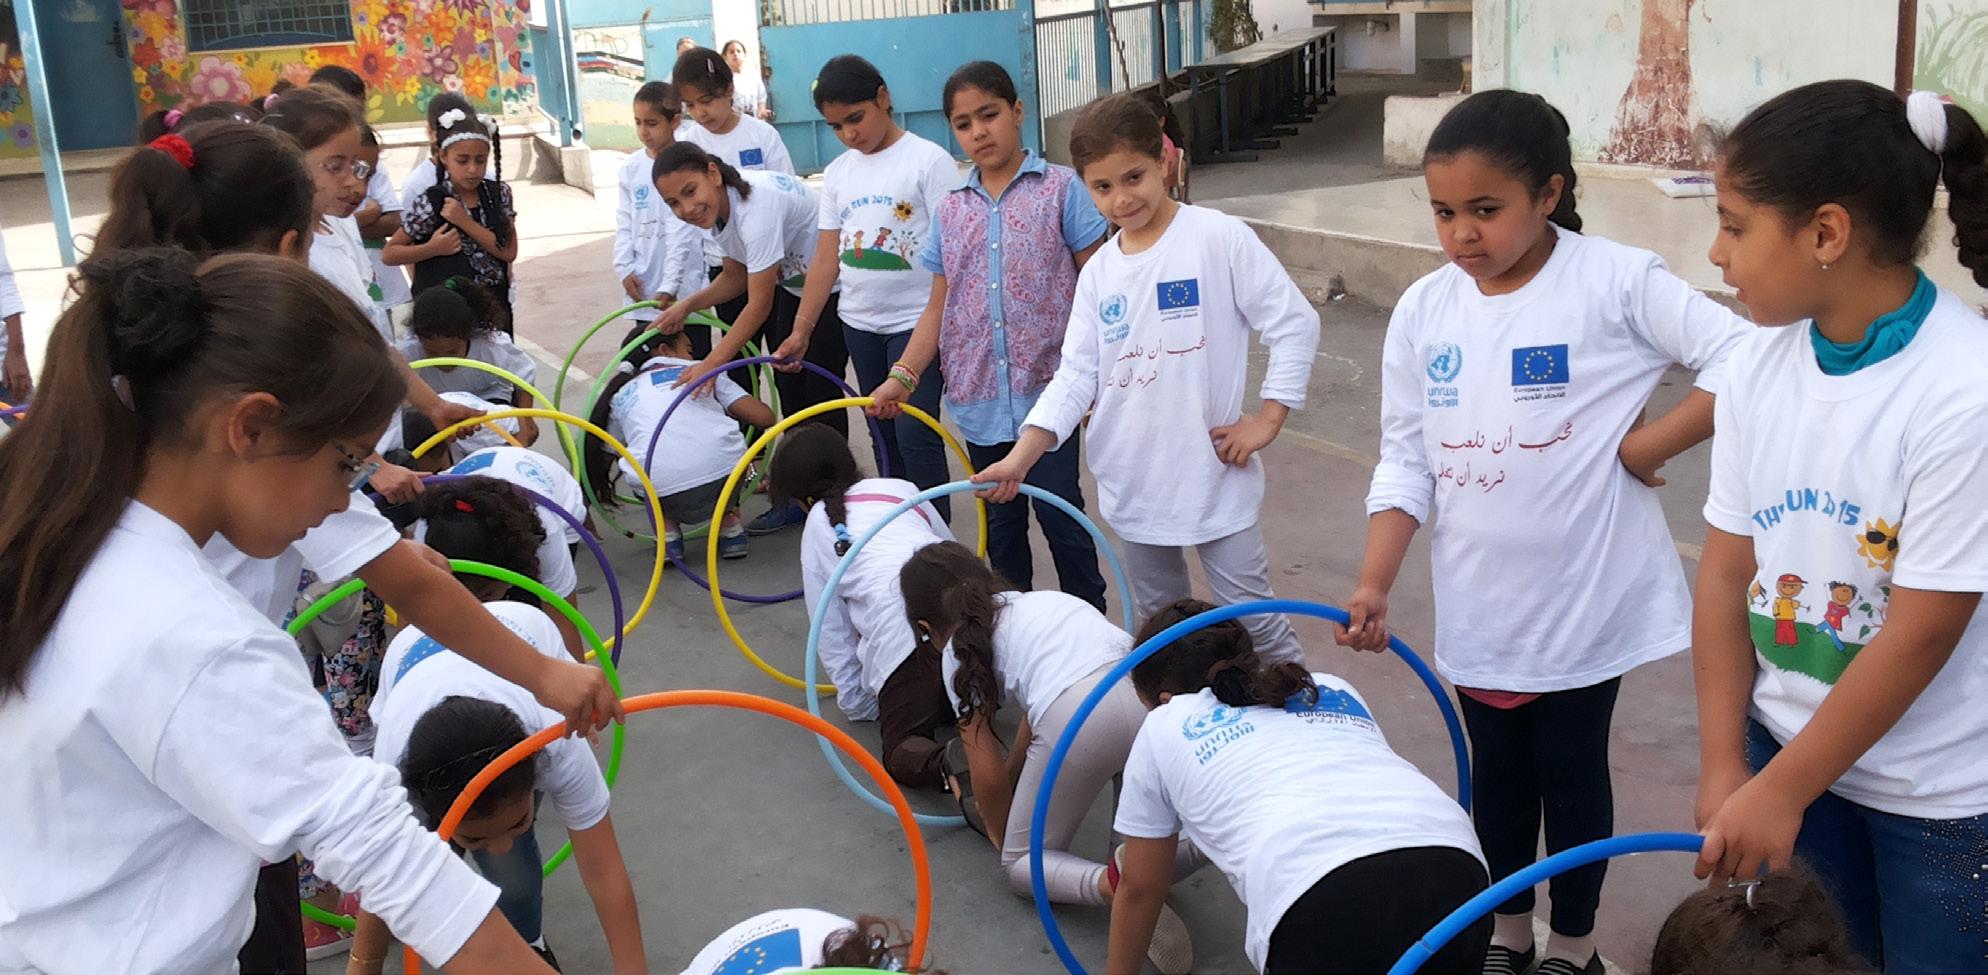 © UNRWA Photo